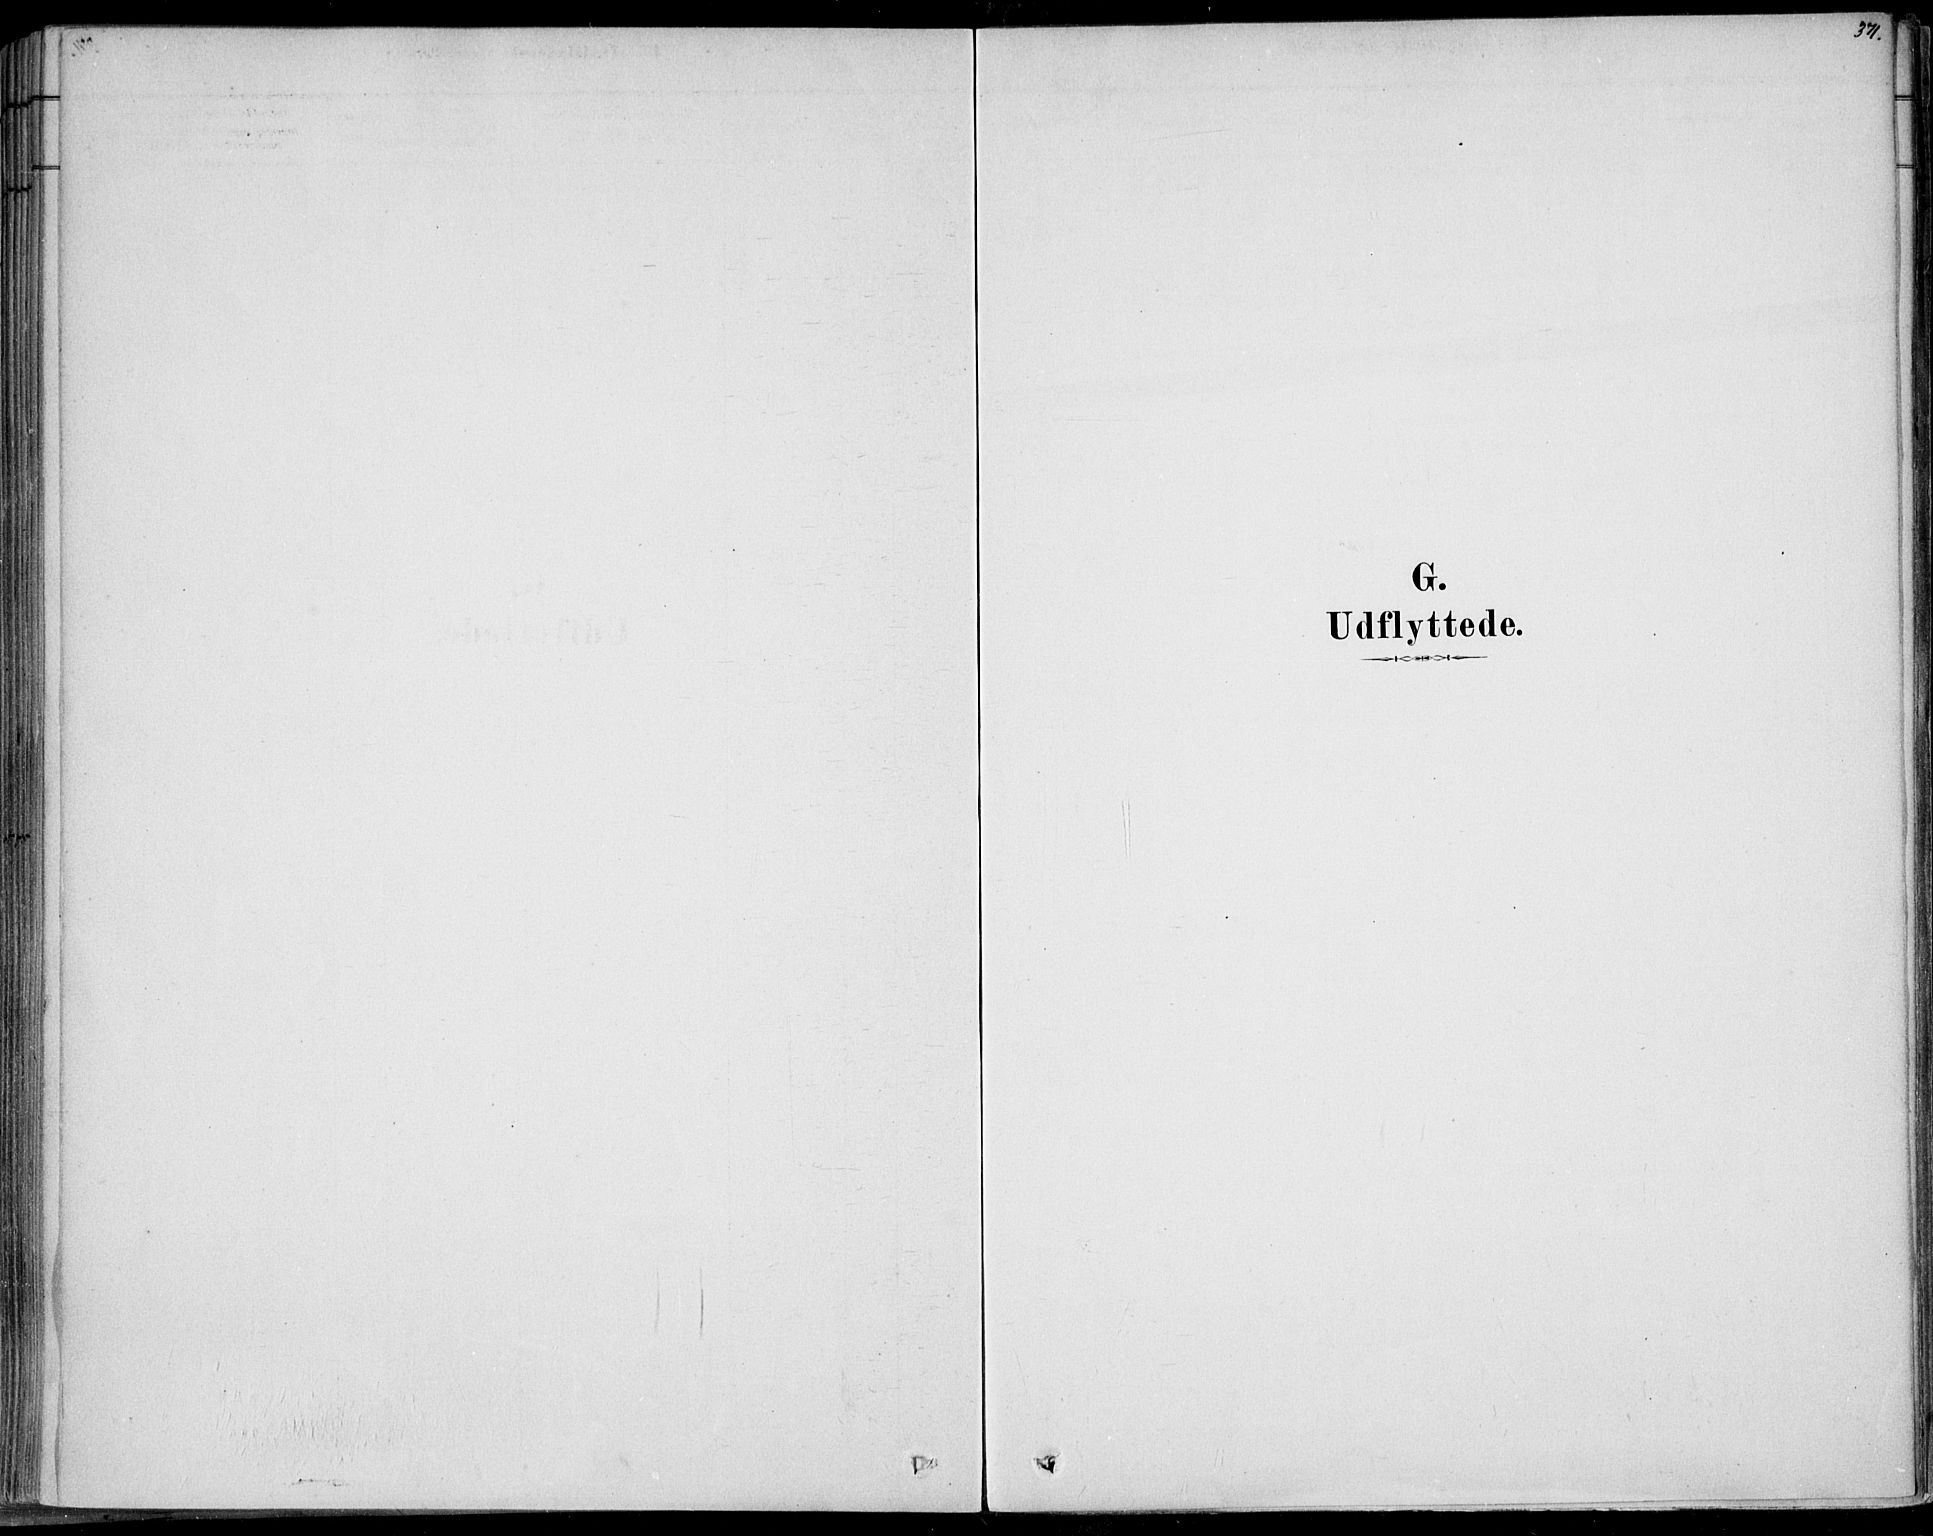 SAKO, Sem kirkebøker, F/Fb/L0004: Ministerialbok nr. II 4, 1878-1891, s. 371